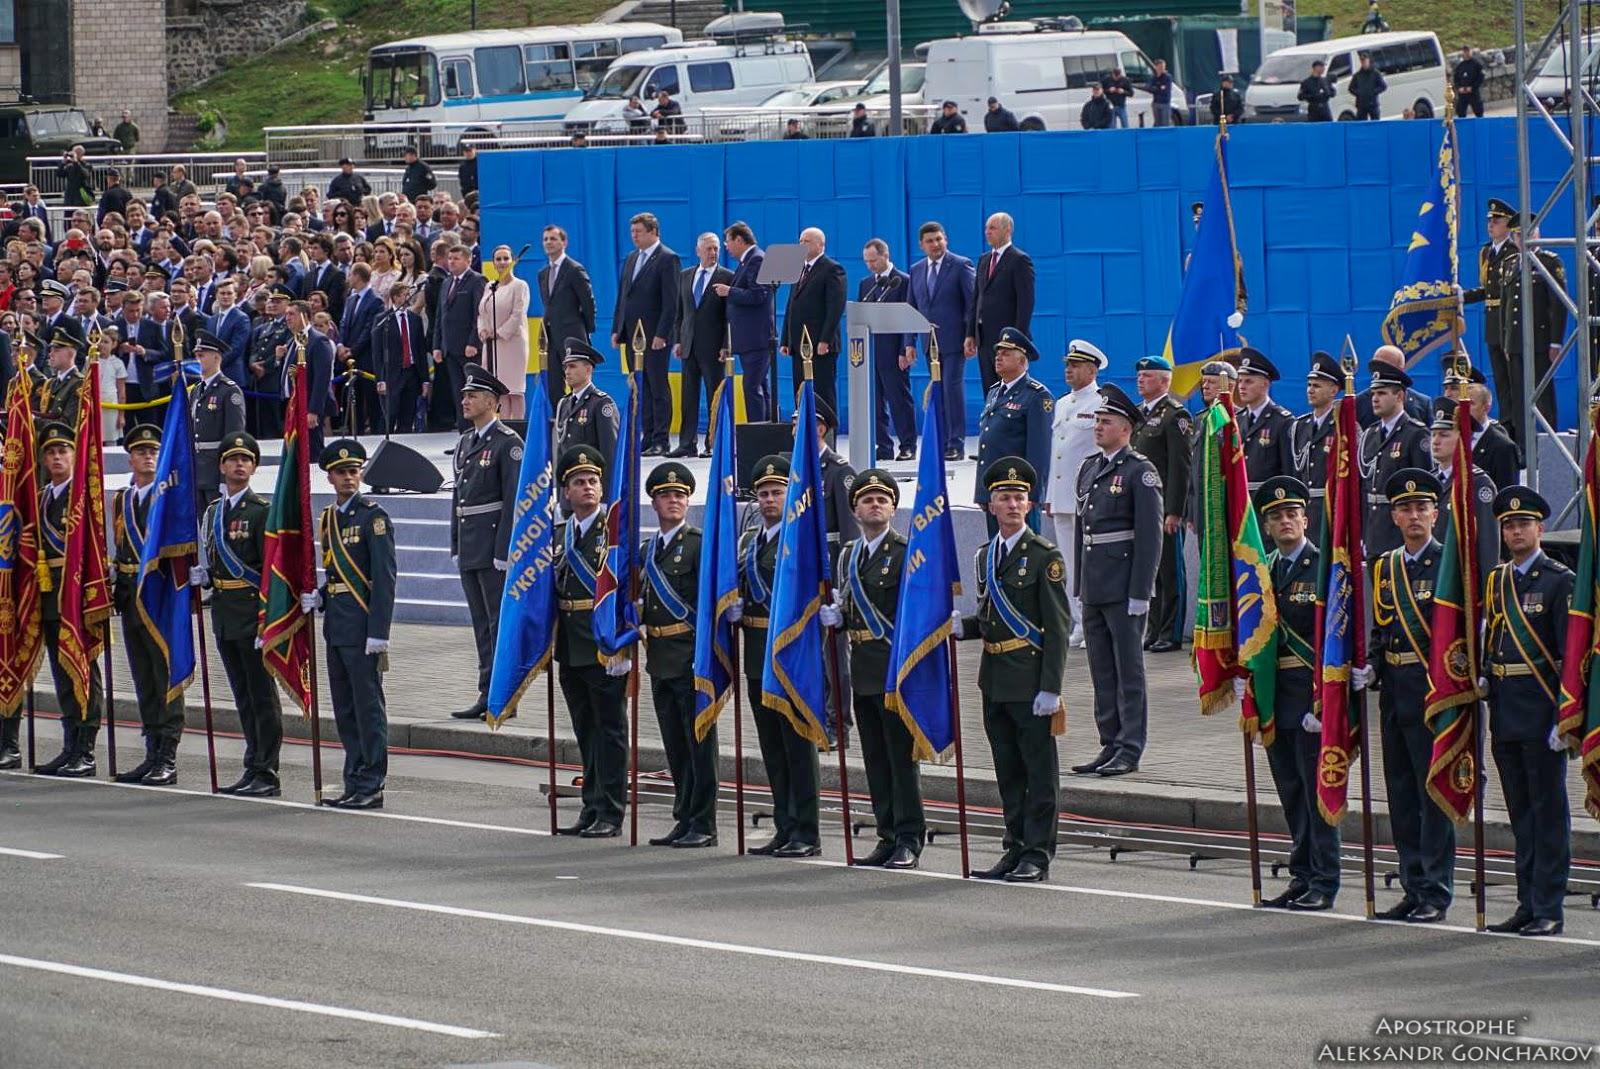 парад військ на День незалежності 2017 на Ukrainian Military Pages